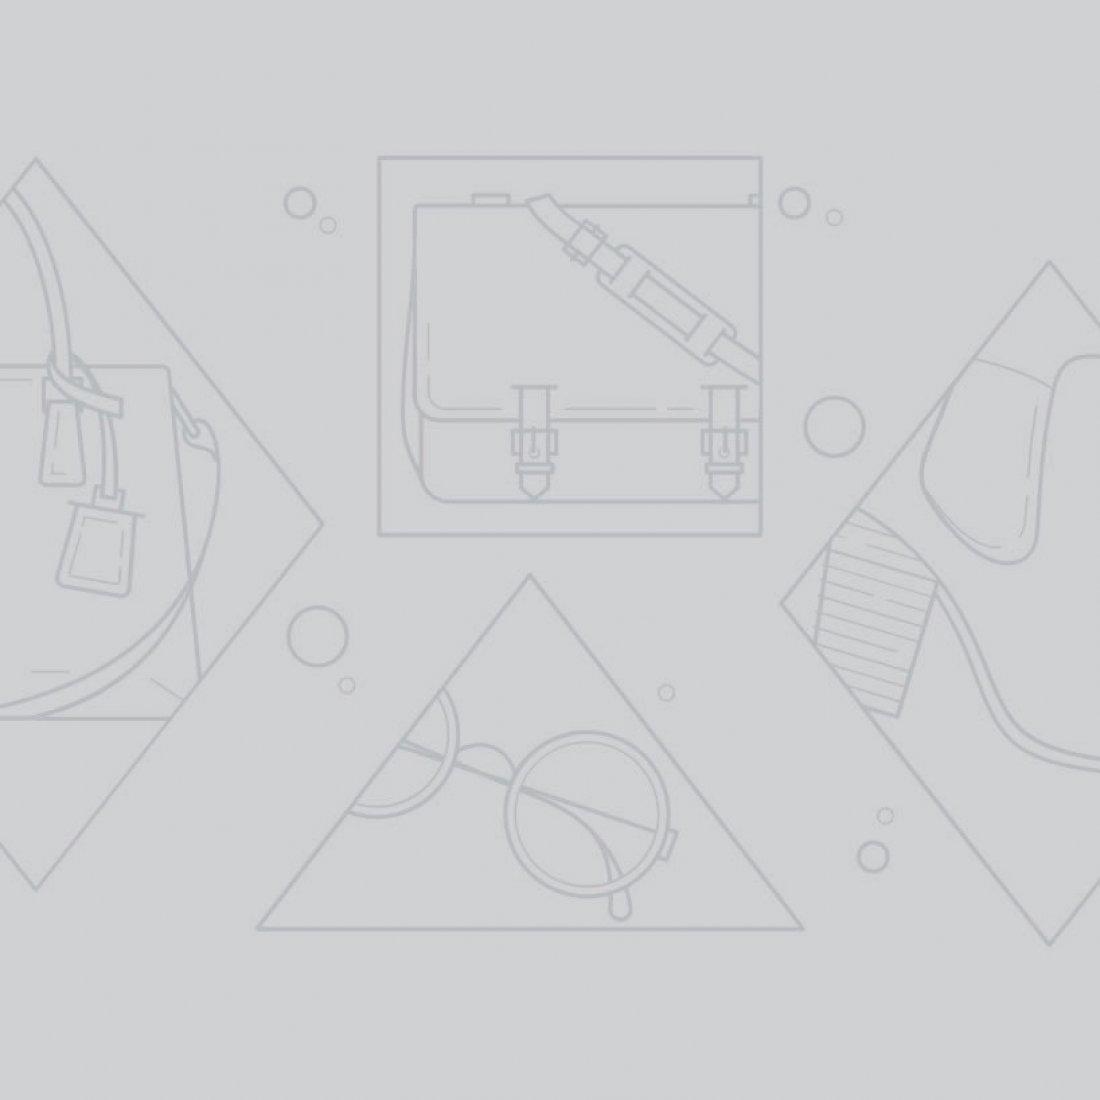 Светящиеся палочка Единорог Ай-ро, оптом - фото 1